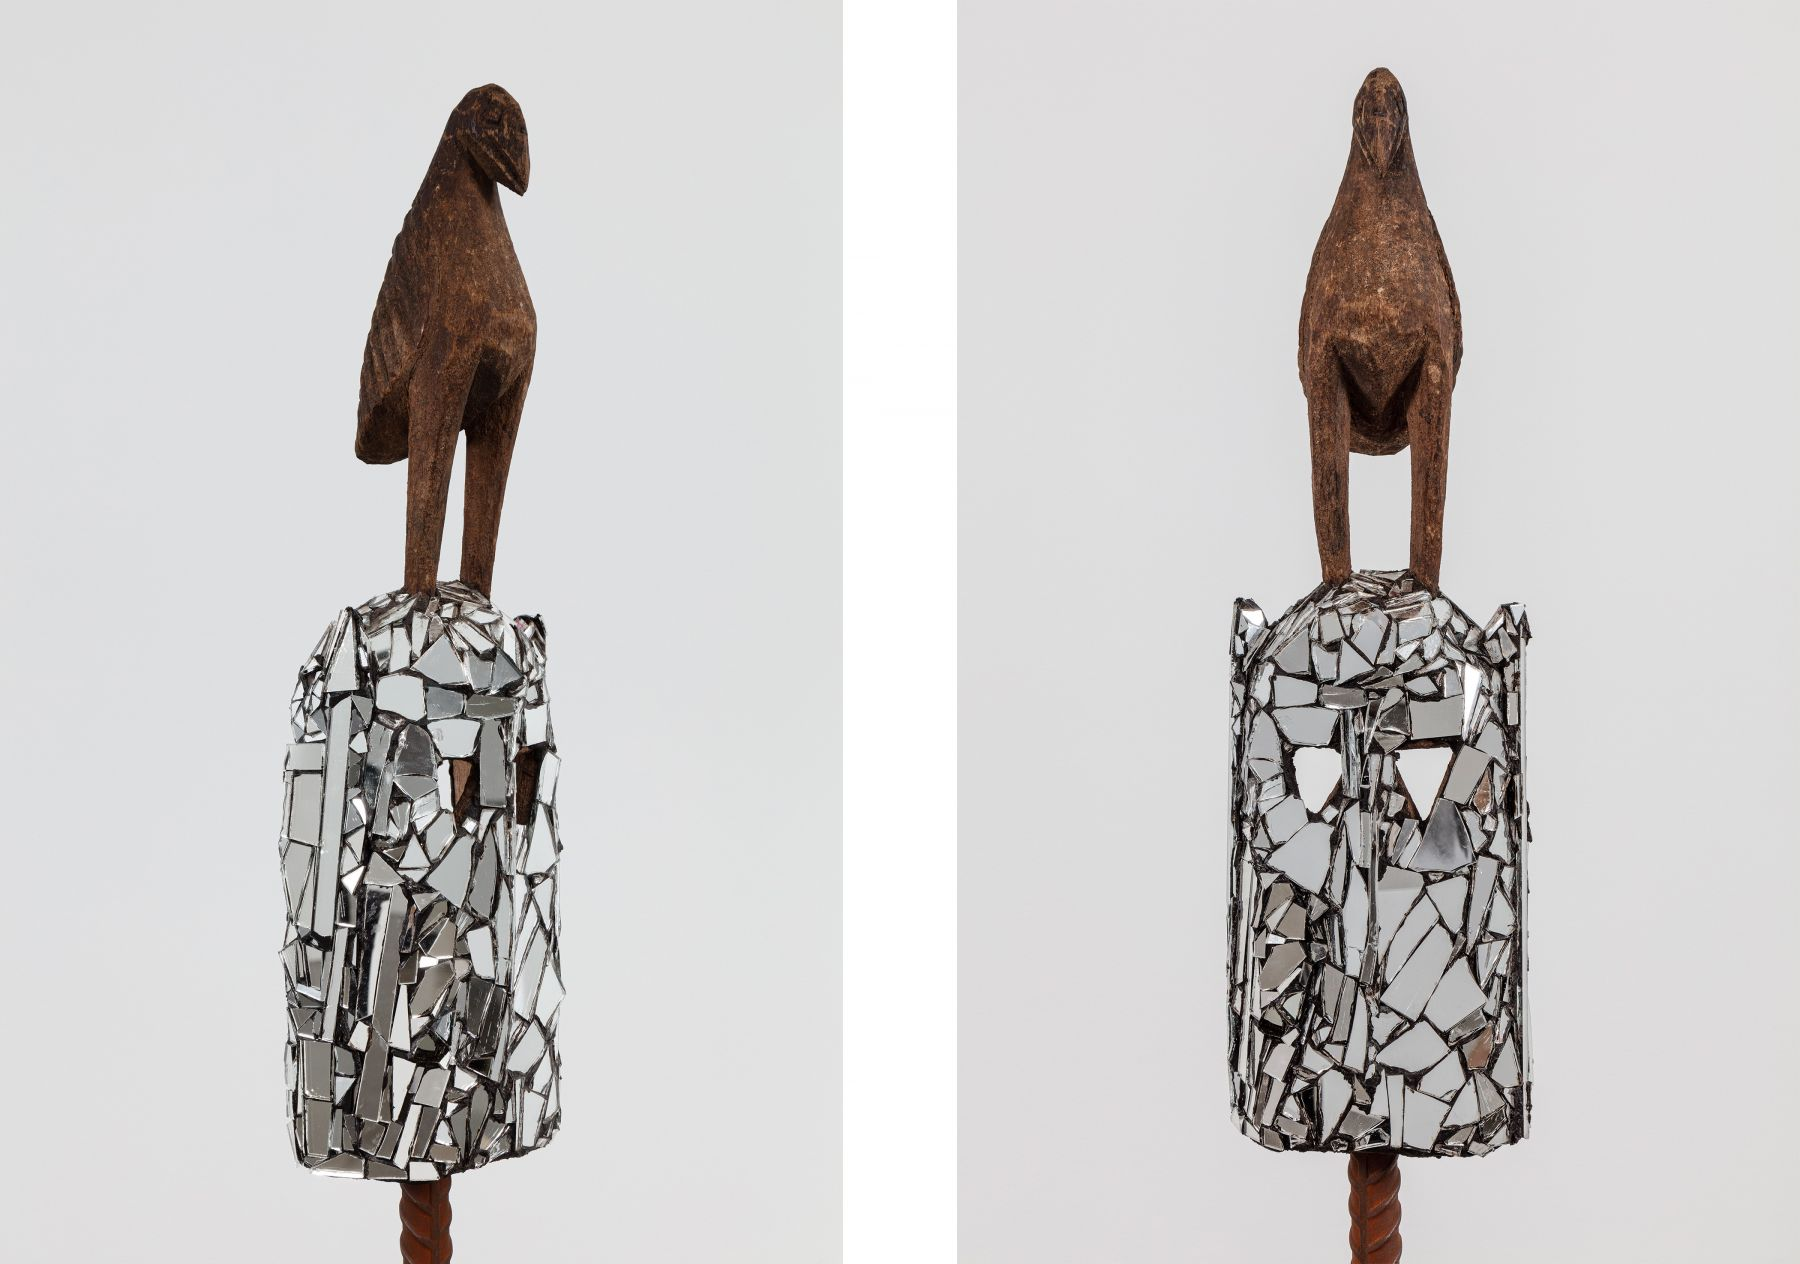 Attia details (bird)